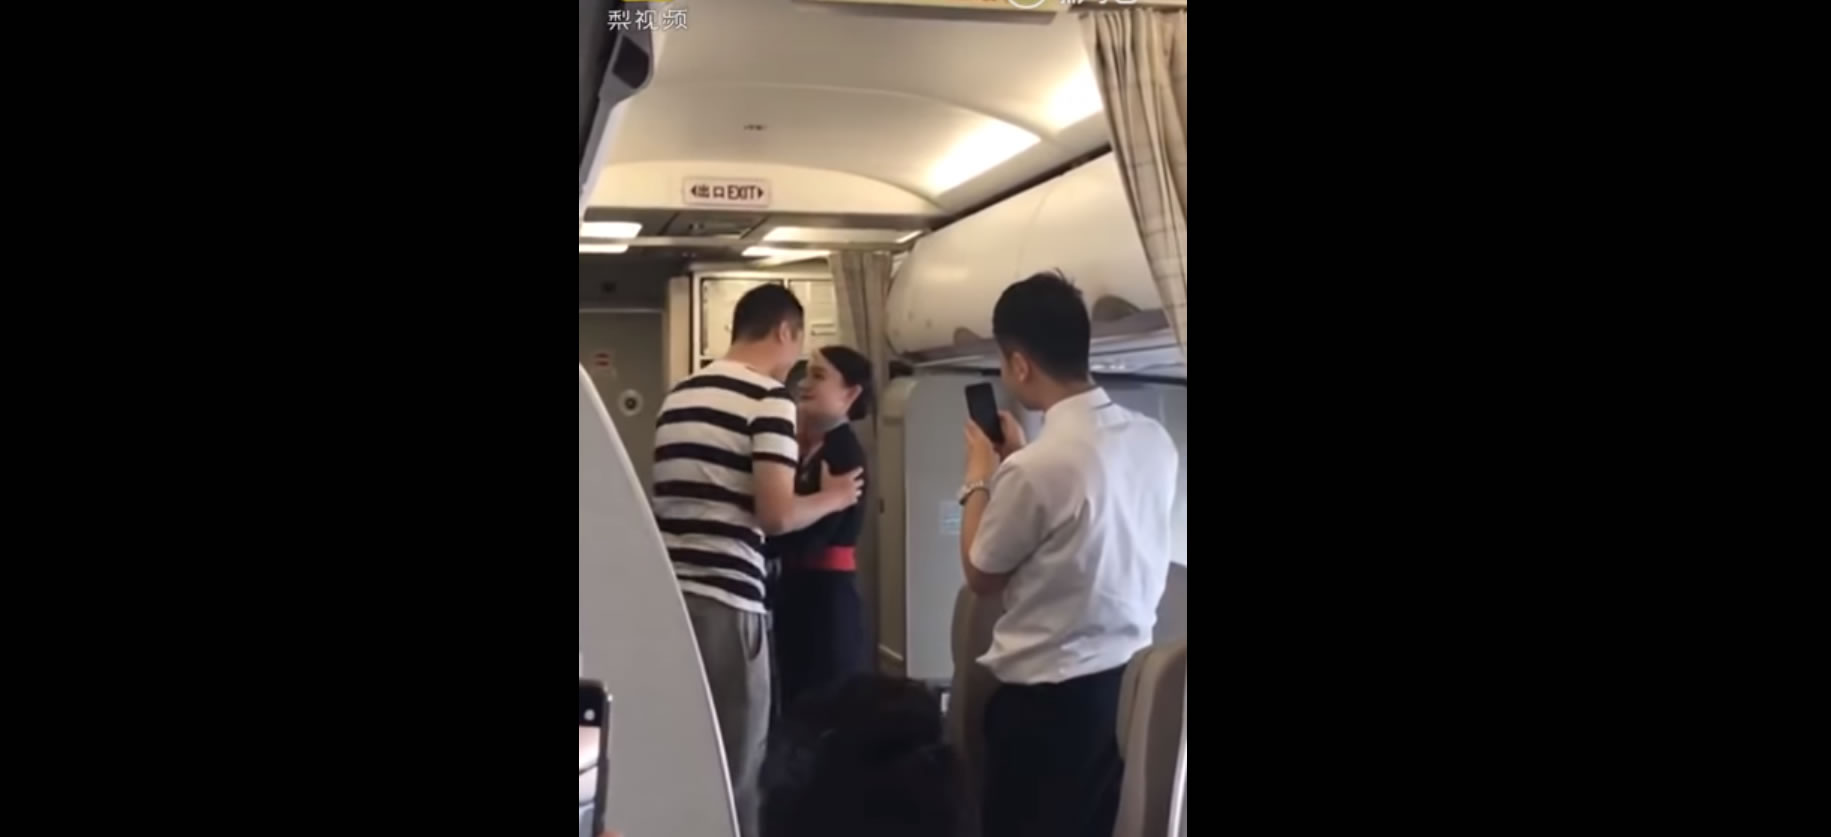 &nbspComissária de bordo é demitida por aceitar pedido de casamento durante voo